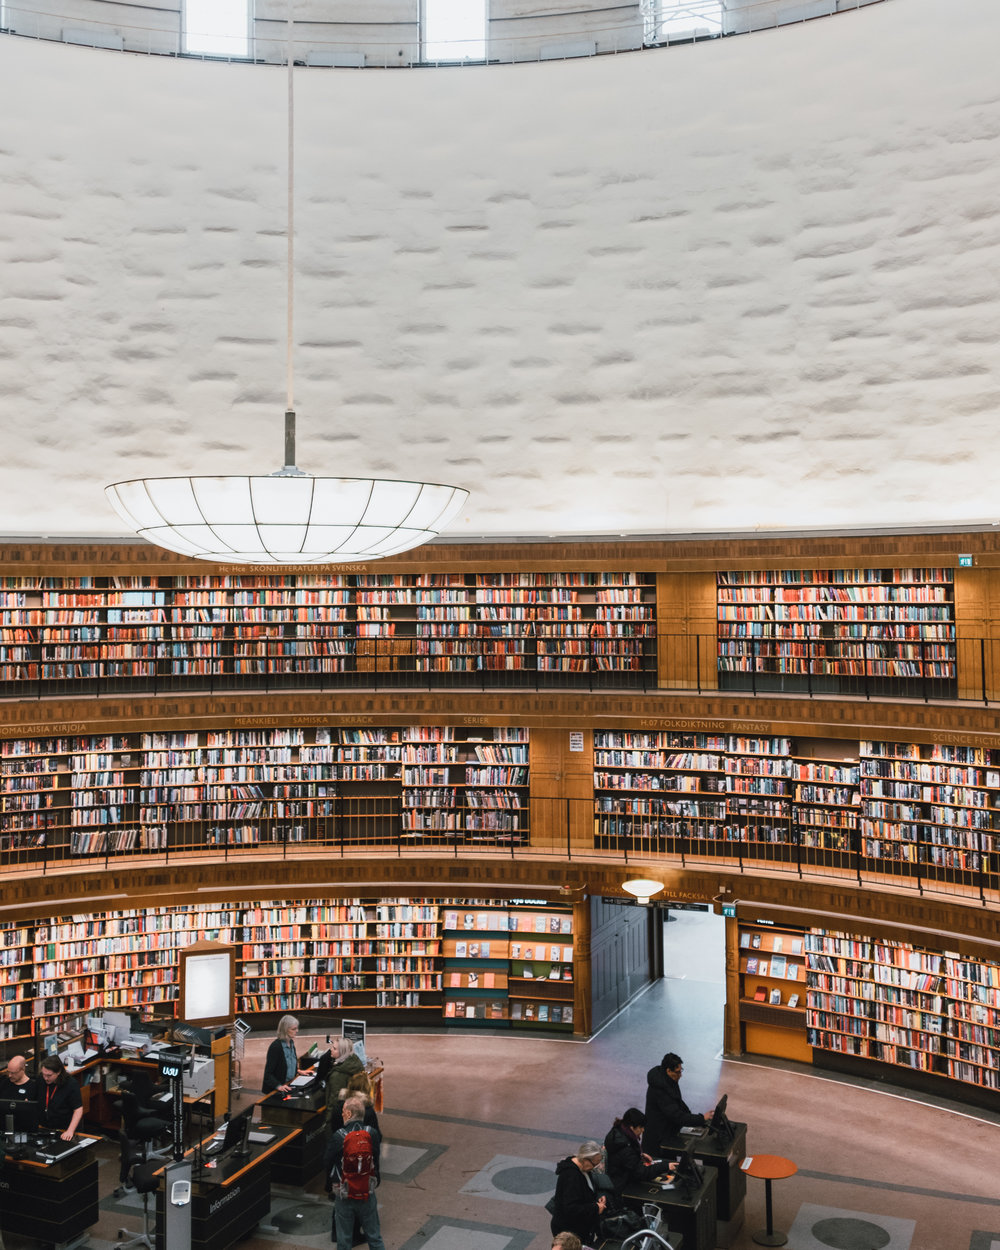 stockholms+stadsbibliotek